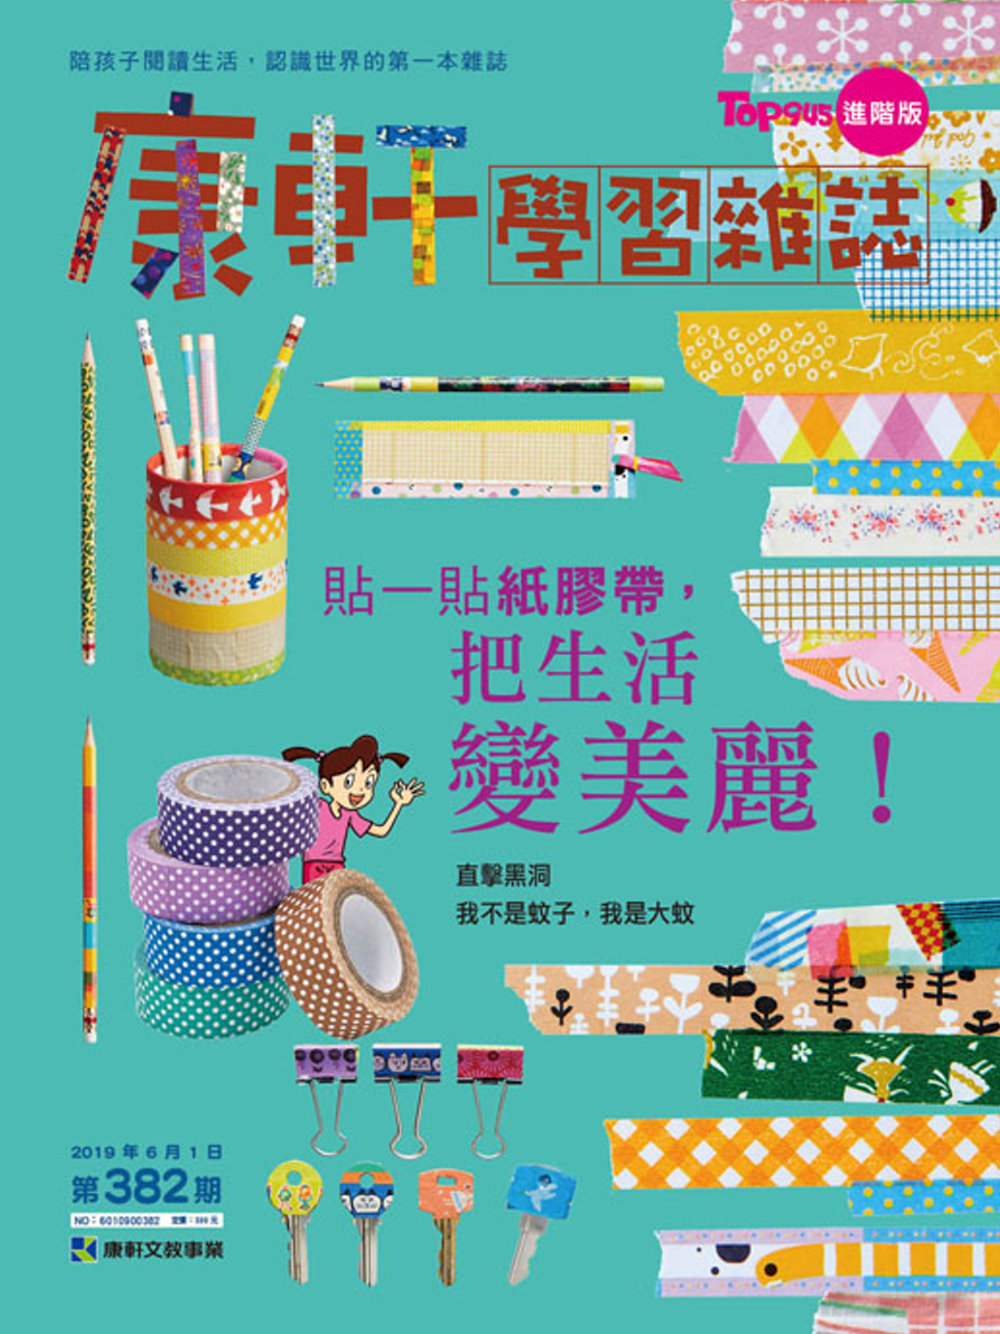 Top945康軒學習雜誌進階版 2019/6/1第382期